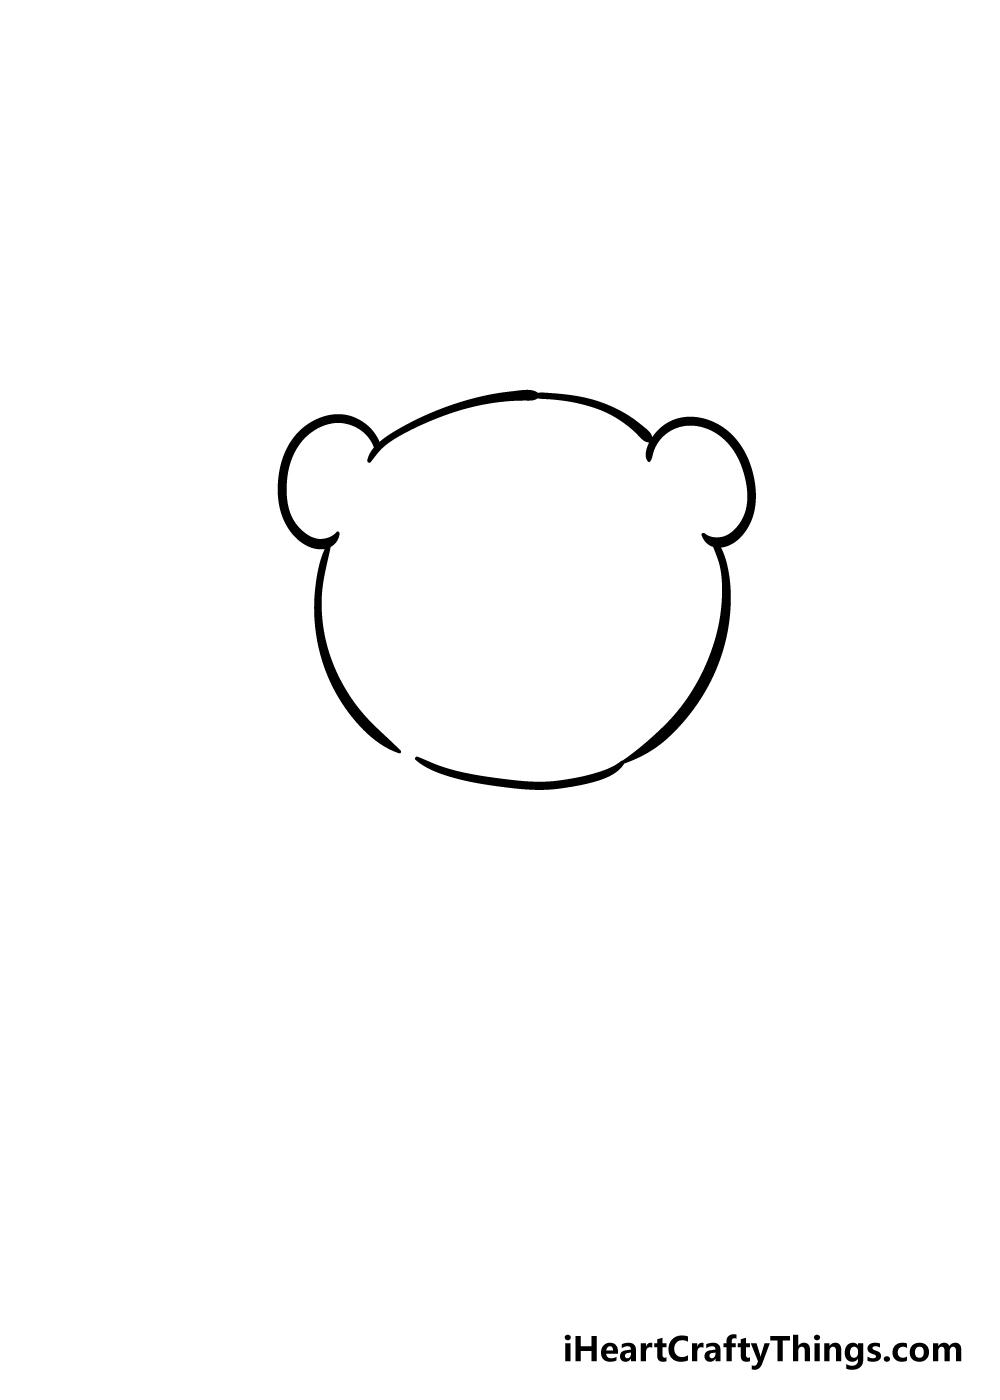 panda drawing step 1